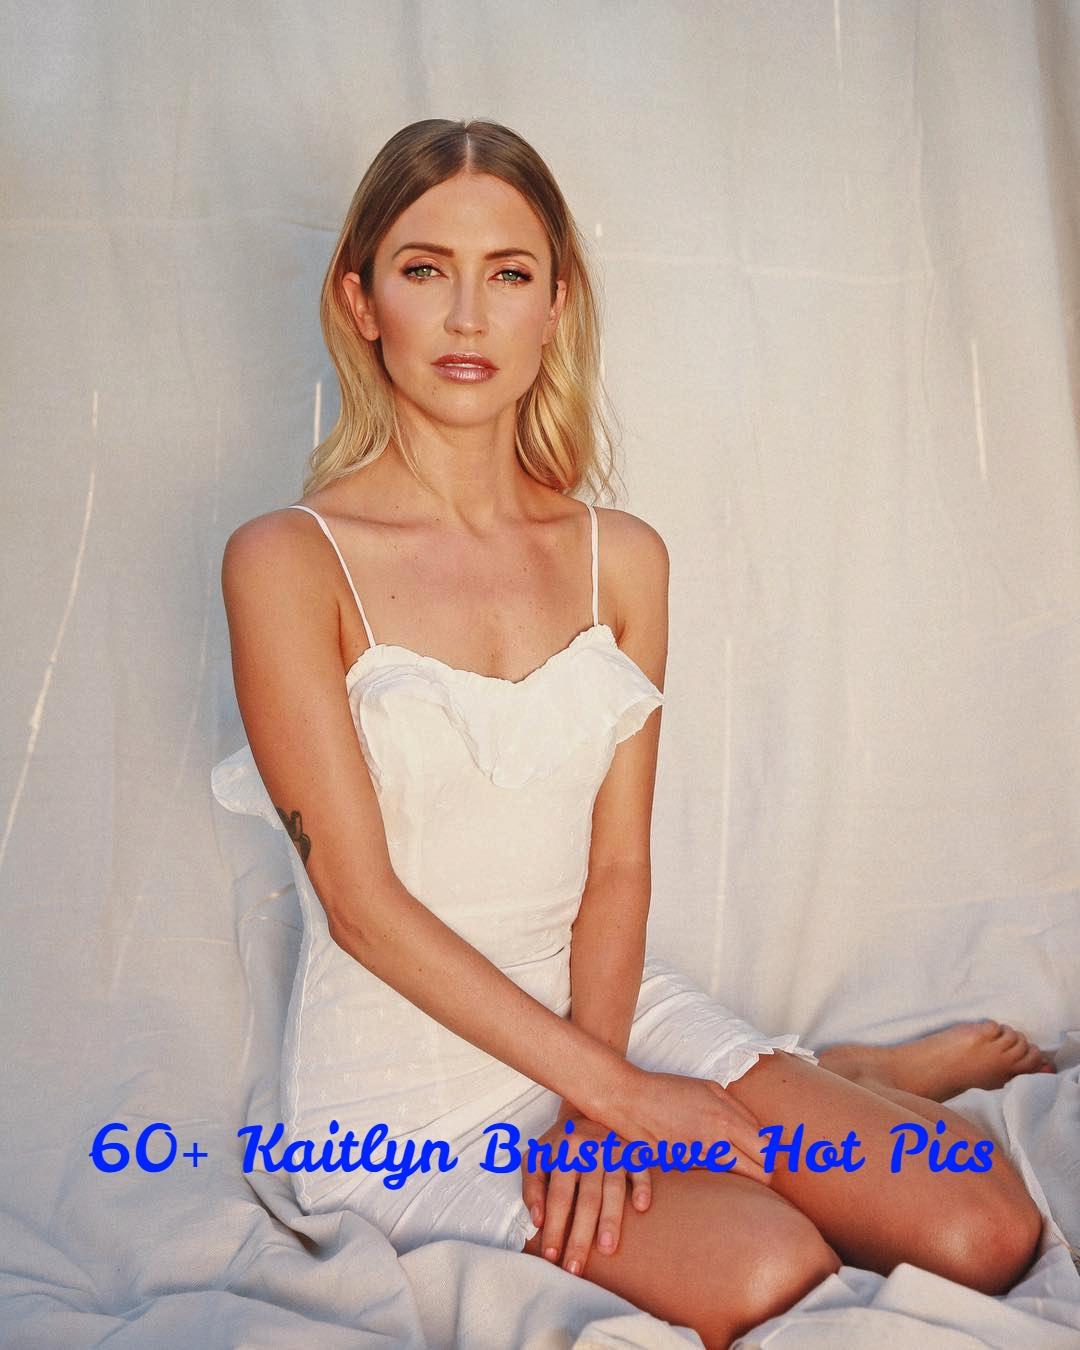 Kaitlyn Bristowe hot pics